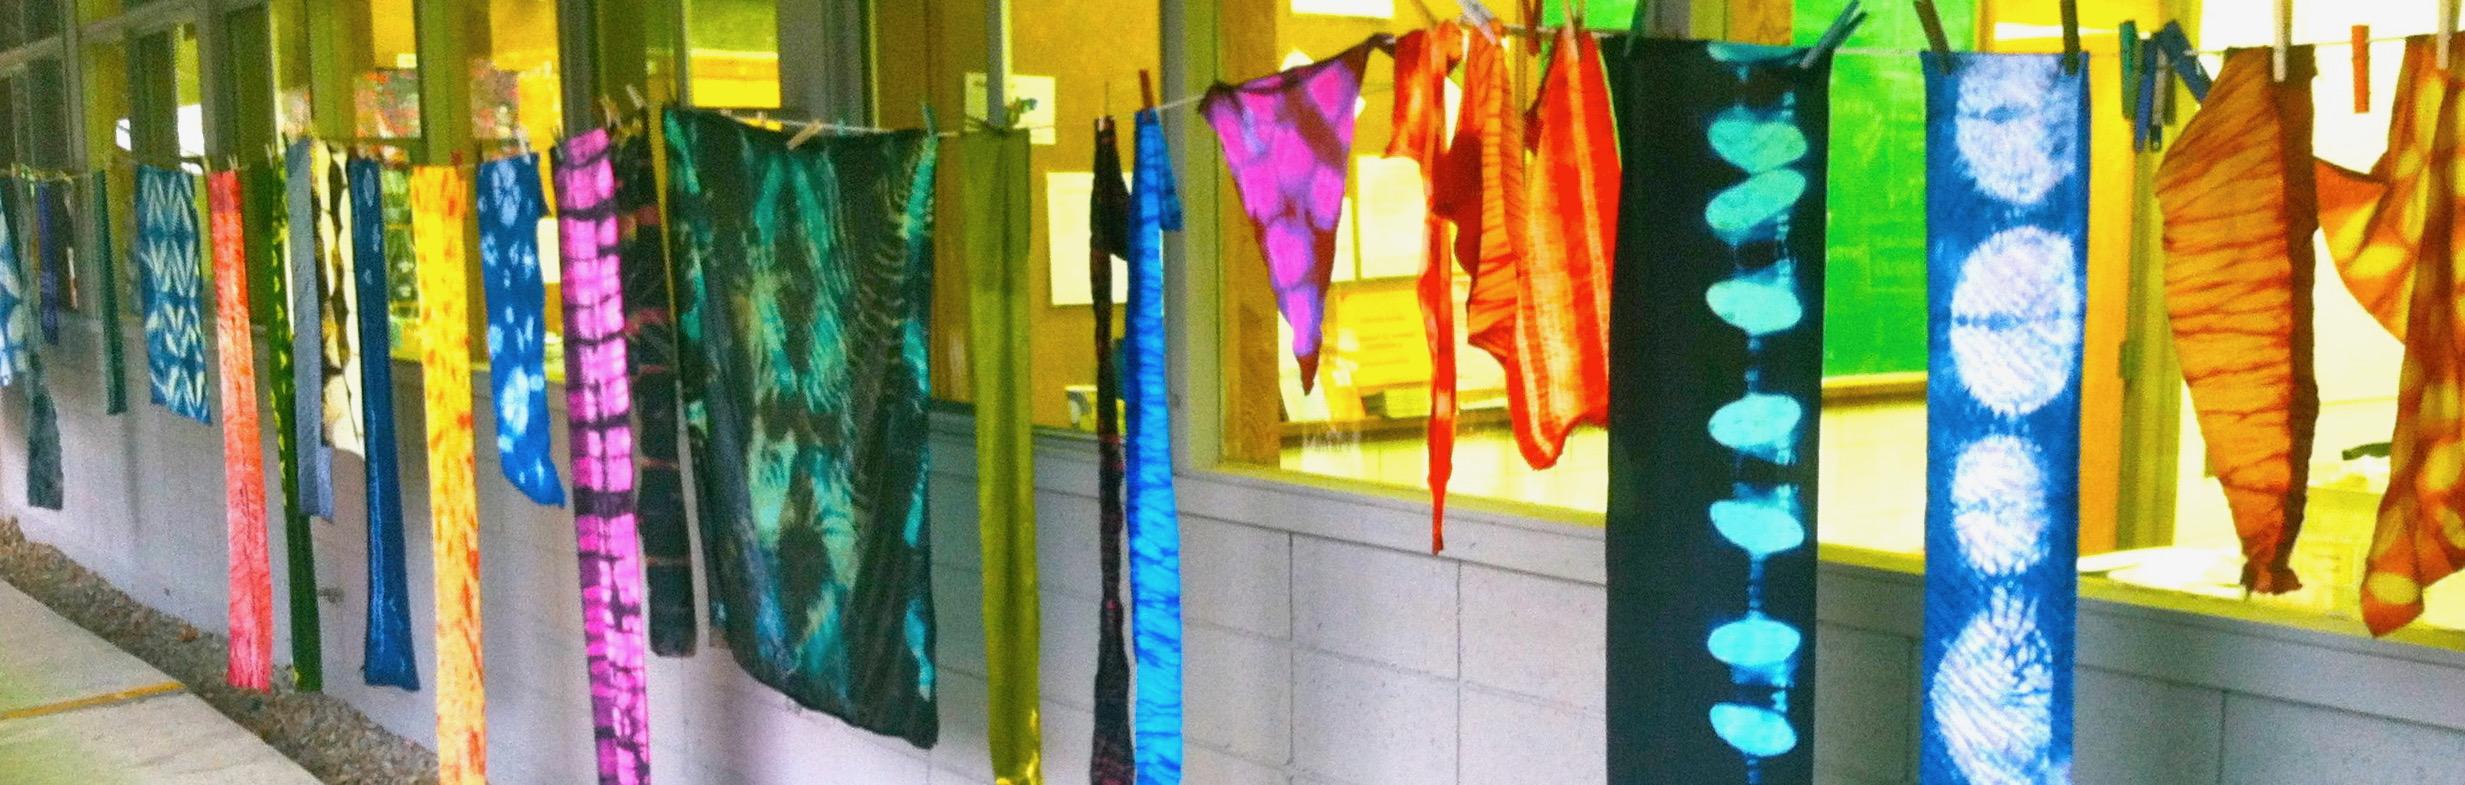 Students' shibori samples, Arrowmont School of Craft